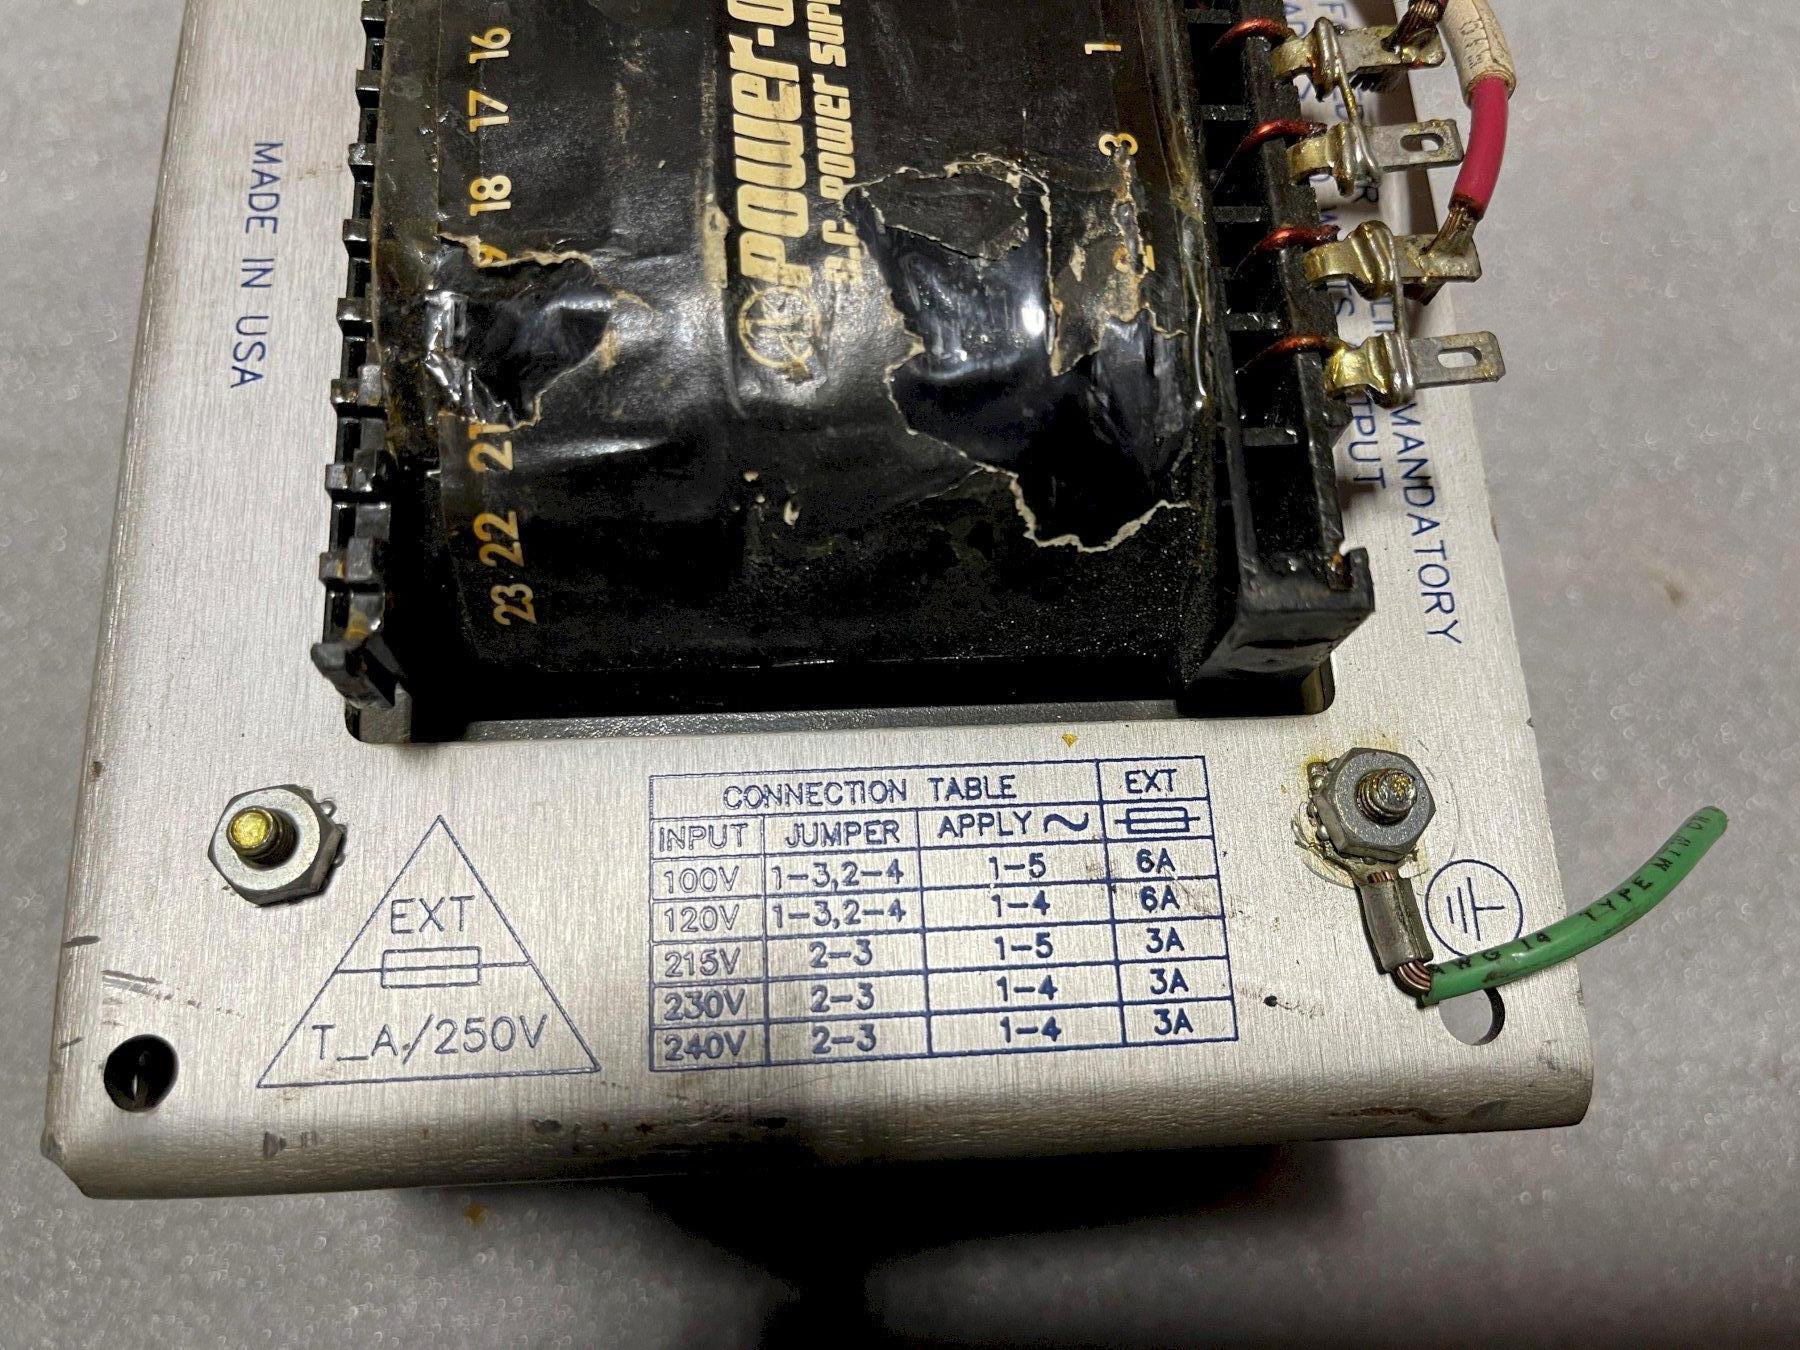 Power Supply F24-12-A